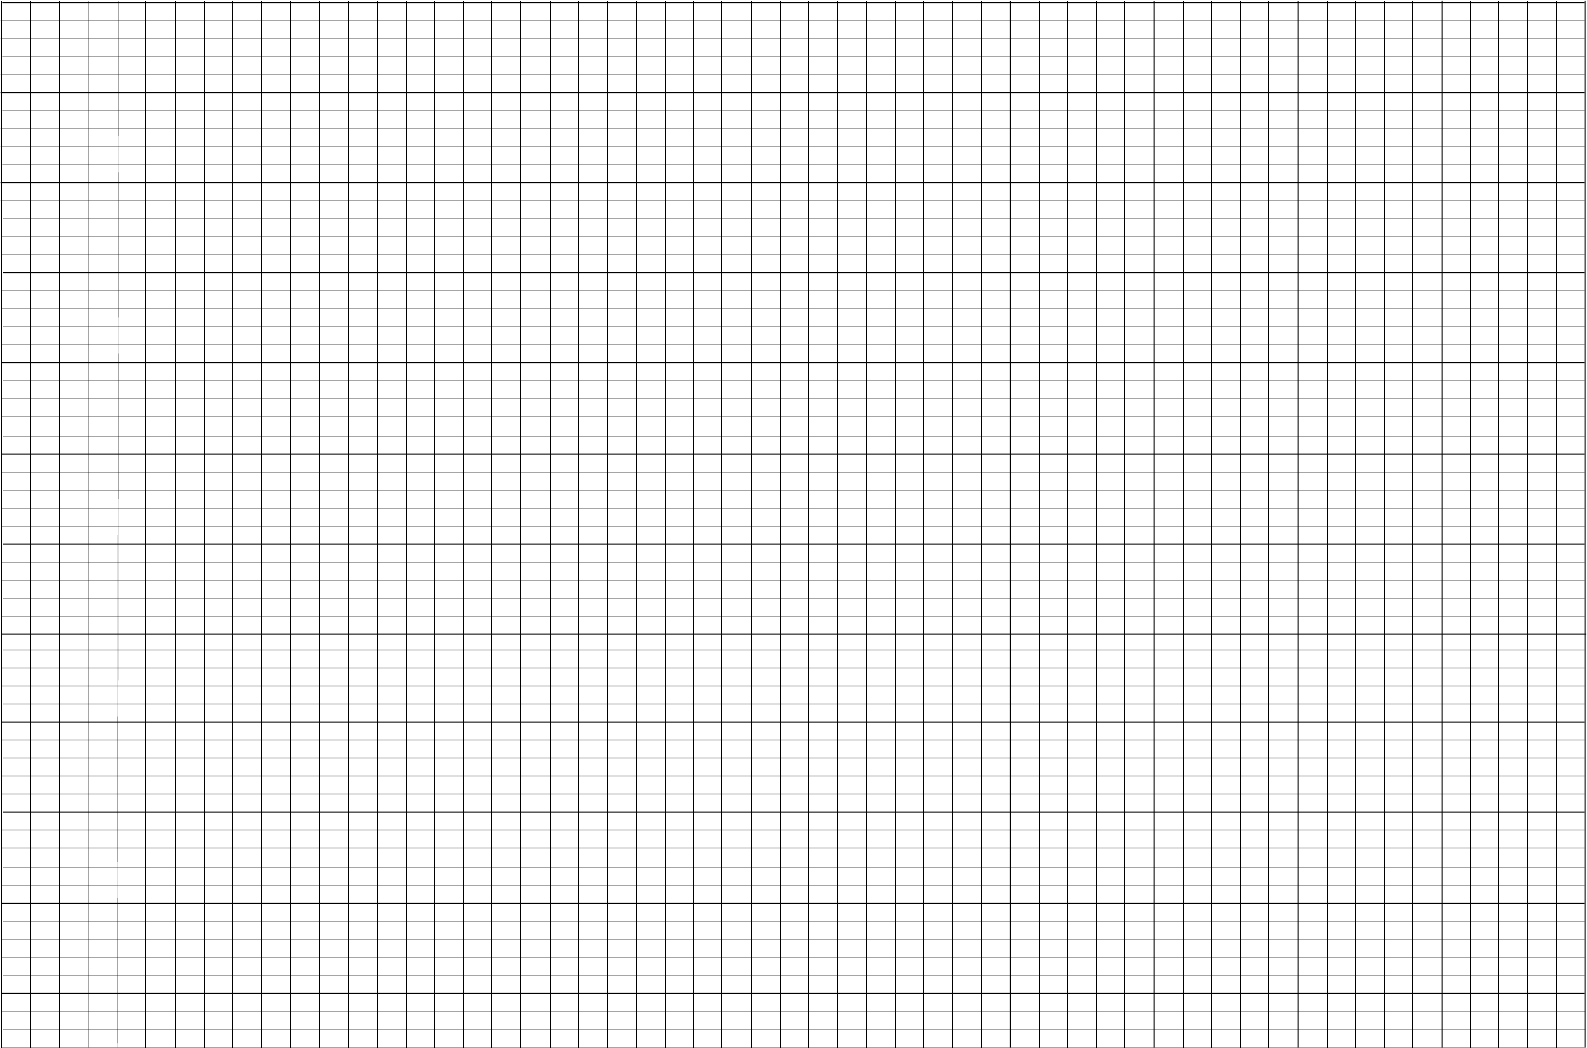 Bathroom Design Graph Paper free landscape design graph paper | bathroom design 2017-2018